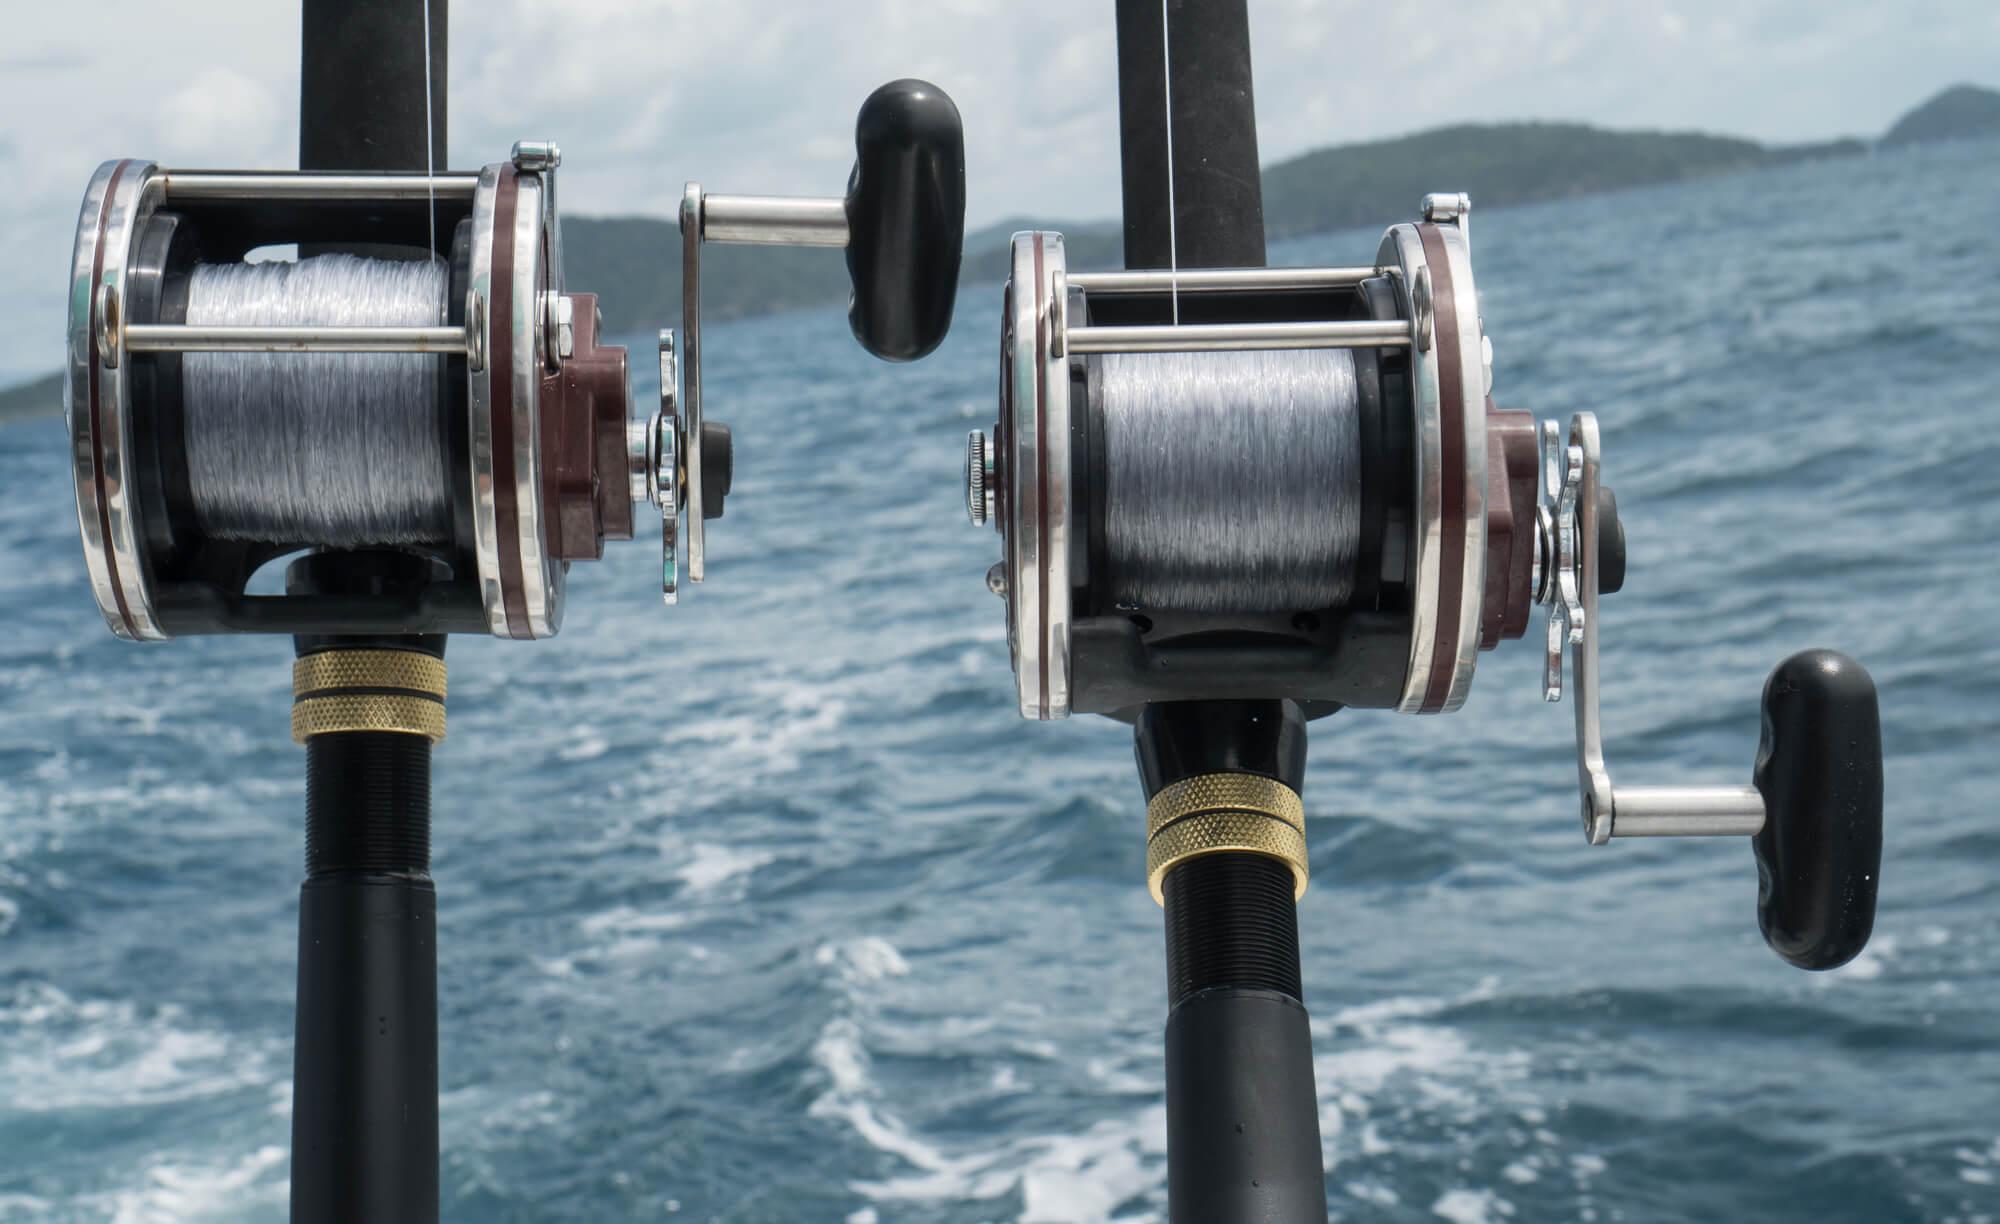 2 Fishing Rods - Pass fishing boat